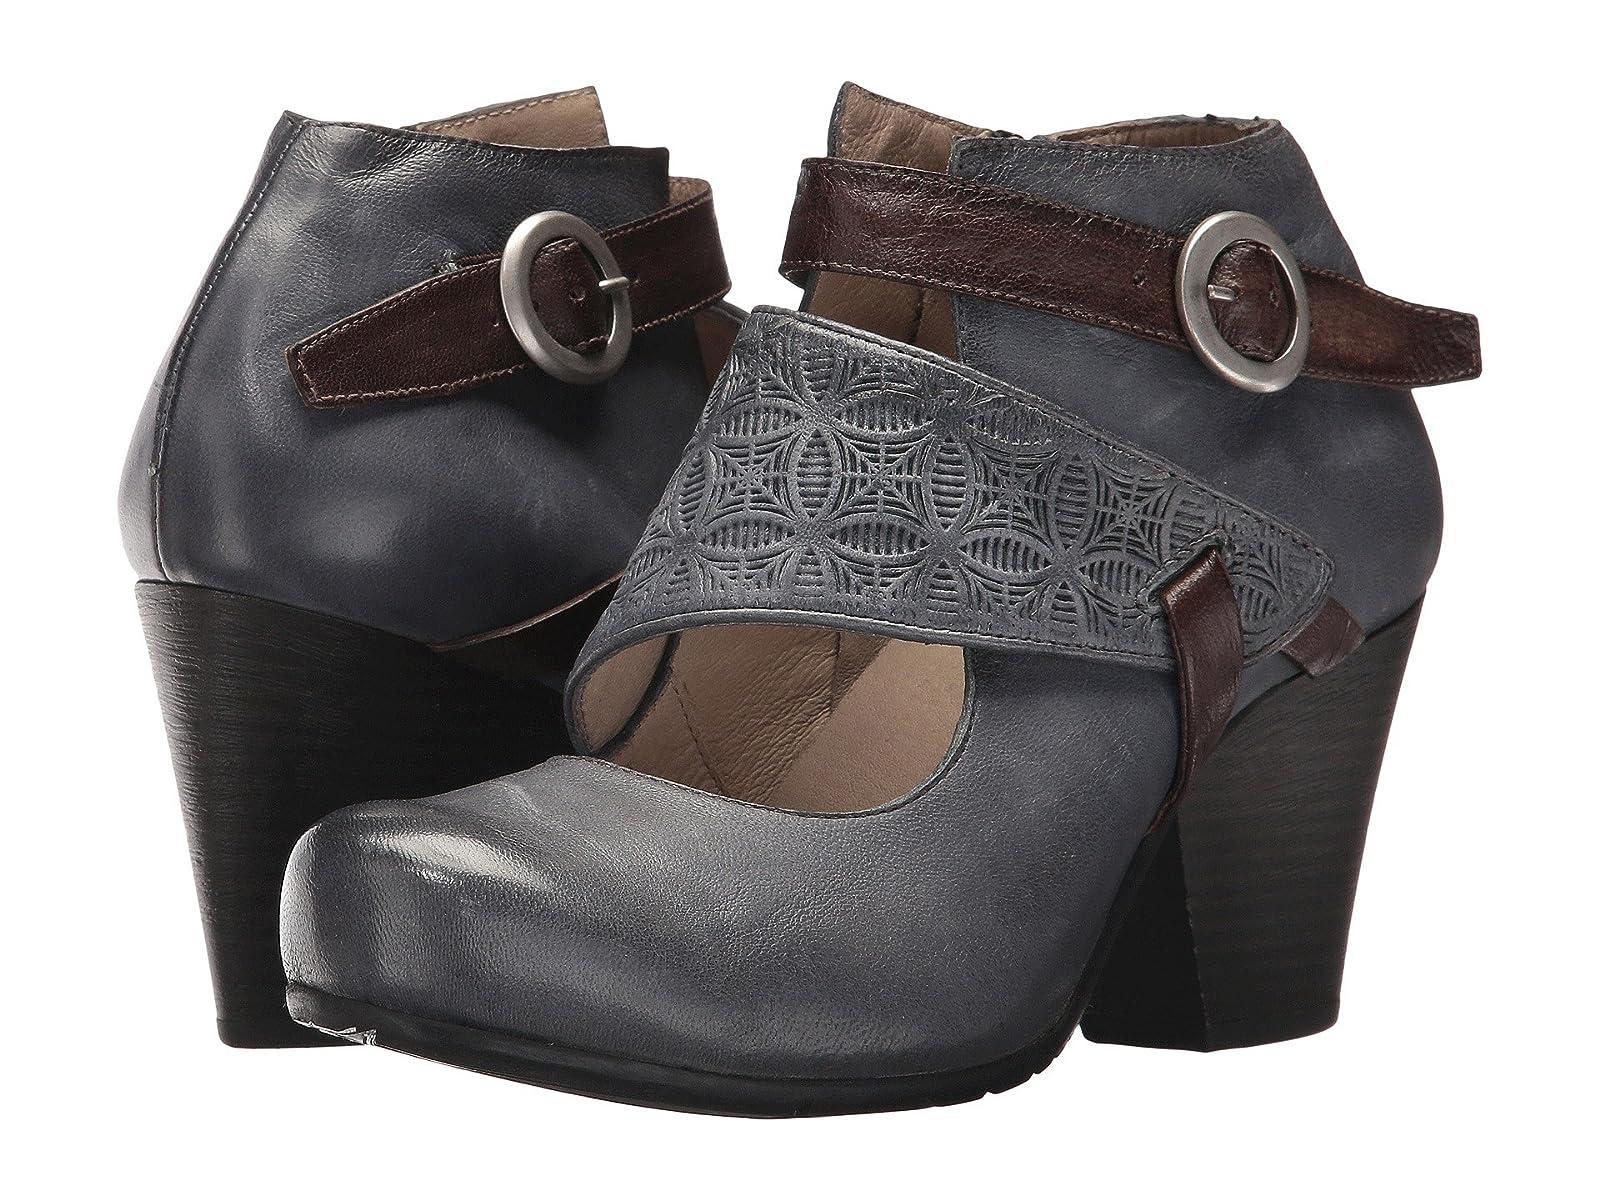 Miz Mooz DaleCheap and distinctive eye-catching shoes